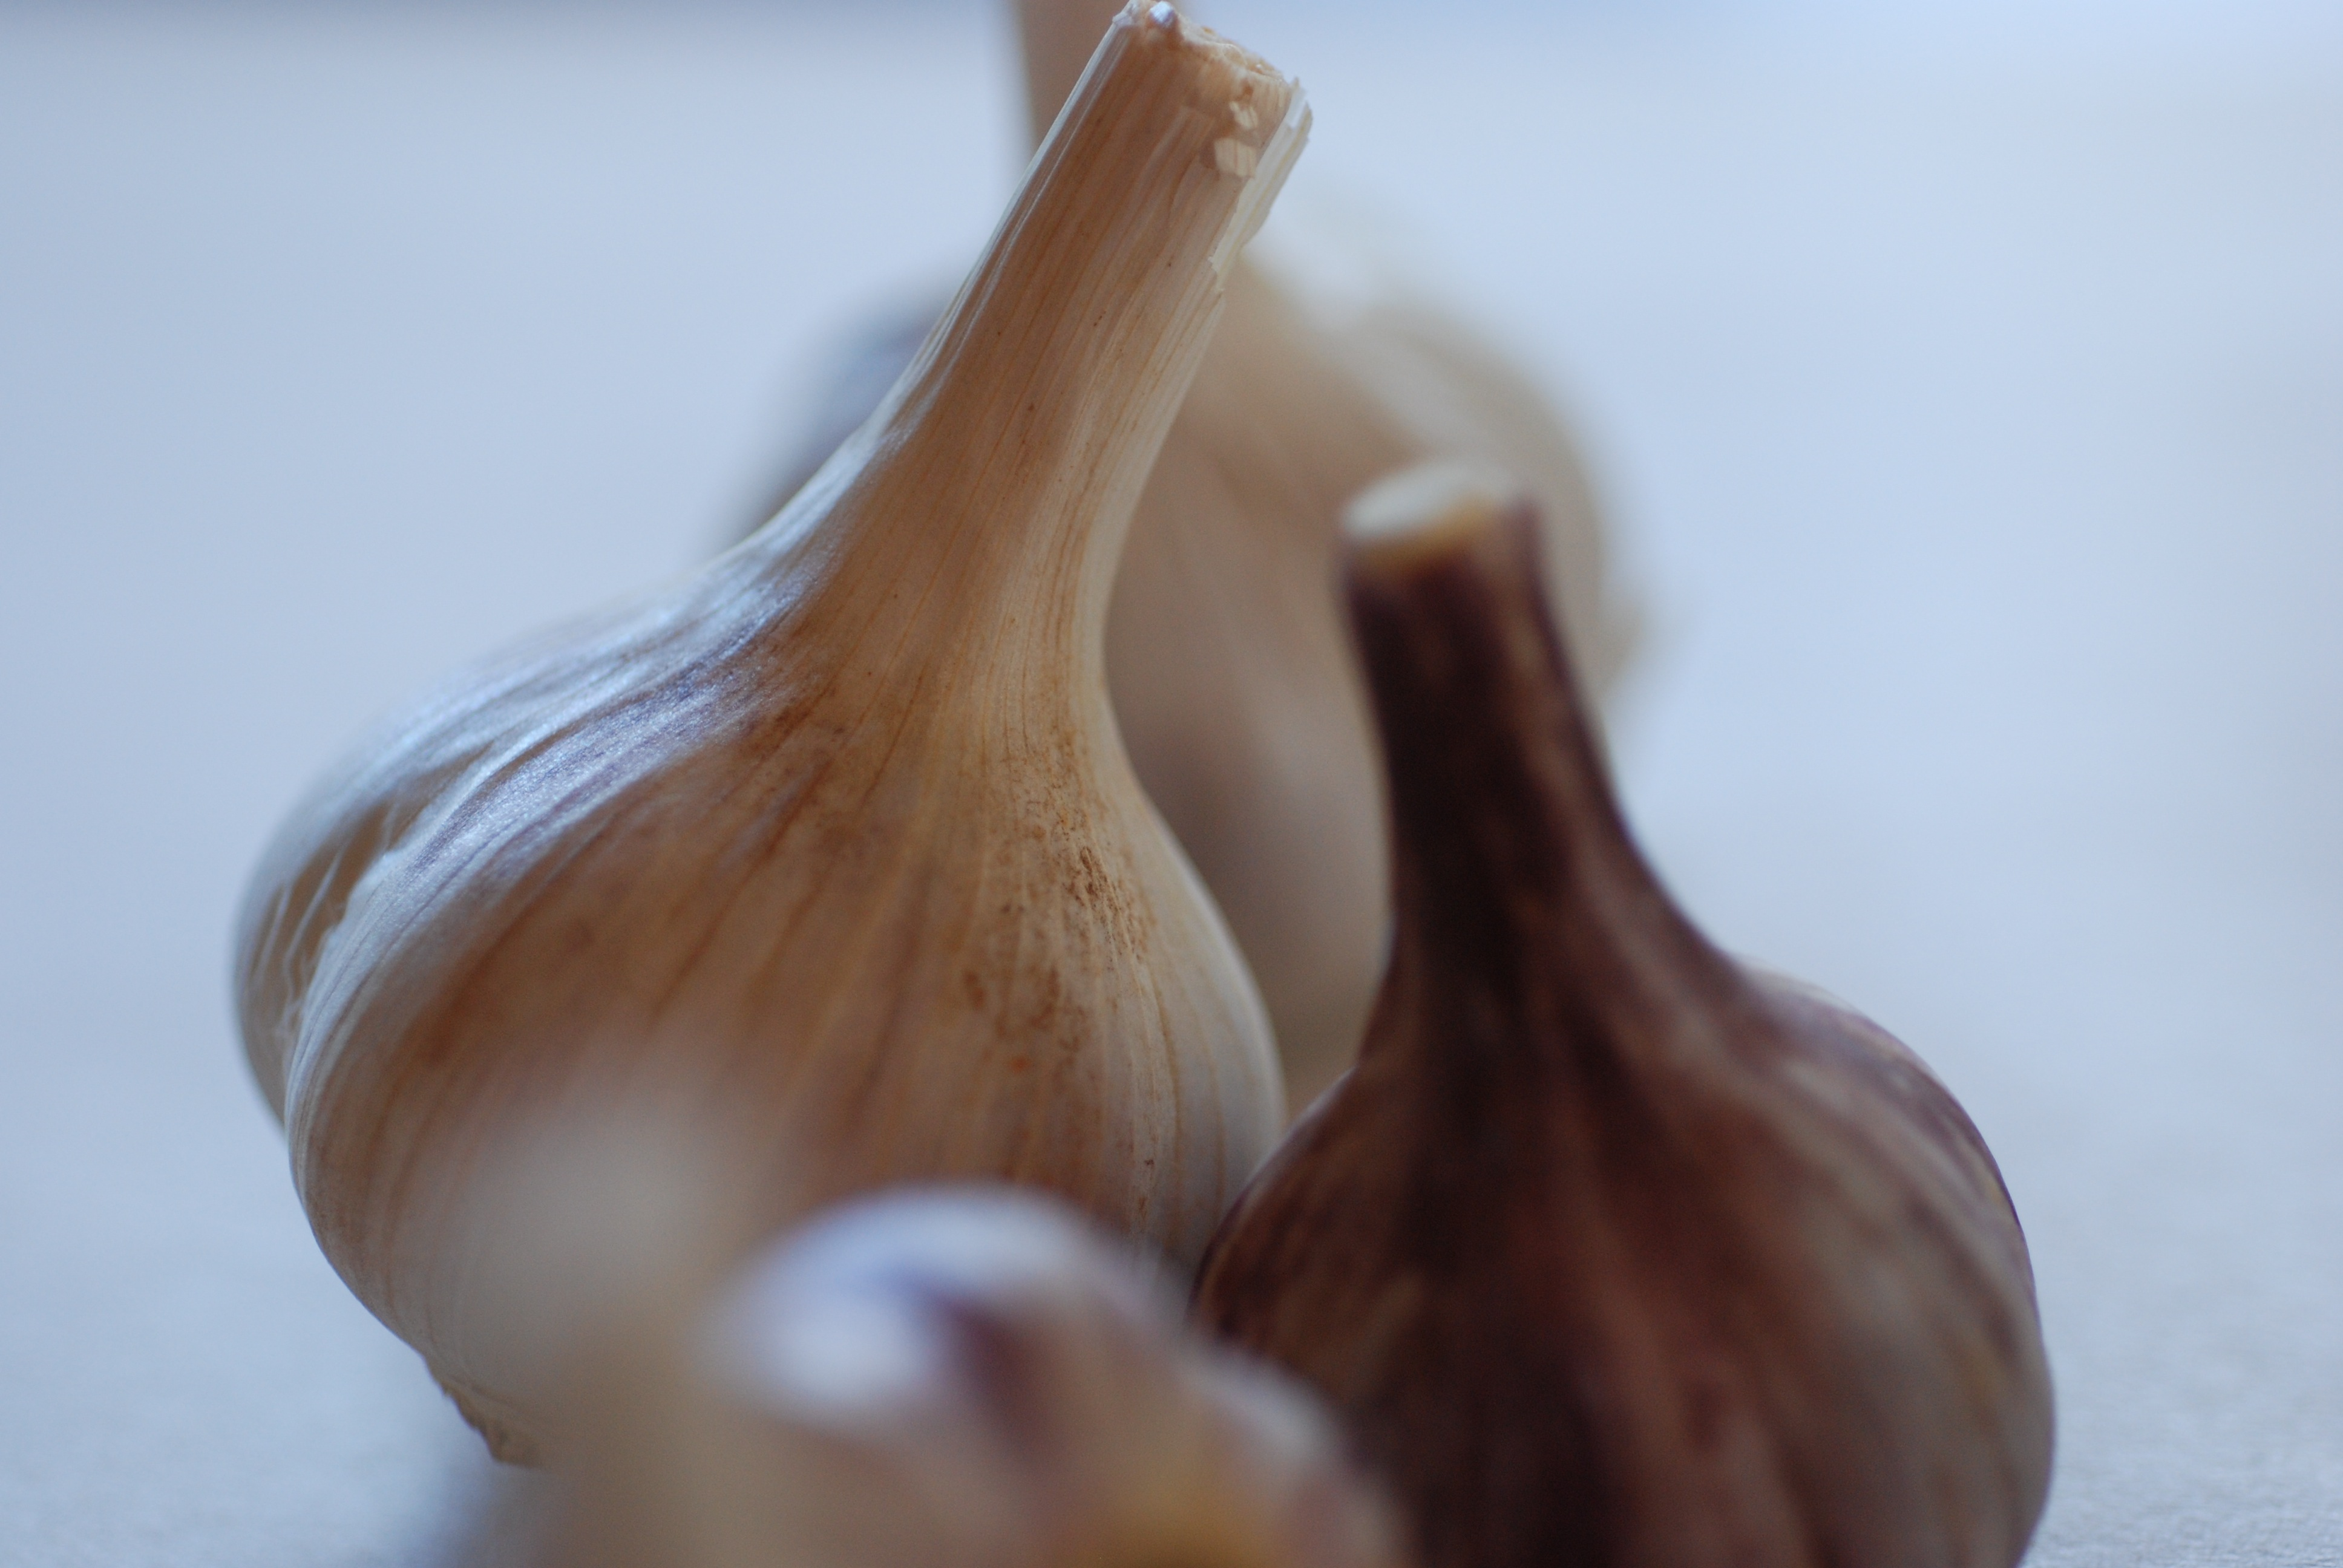 Italian Purple garlic